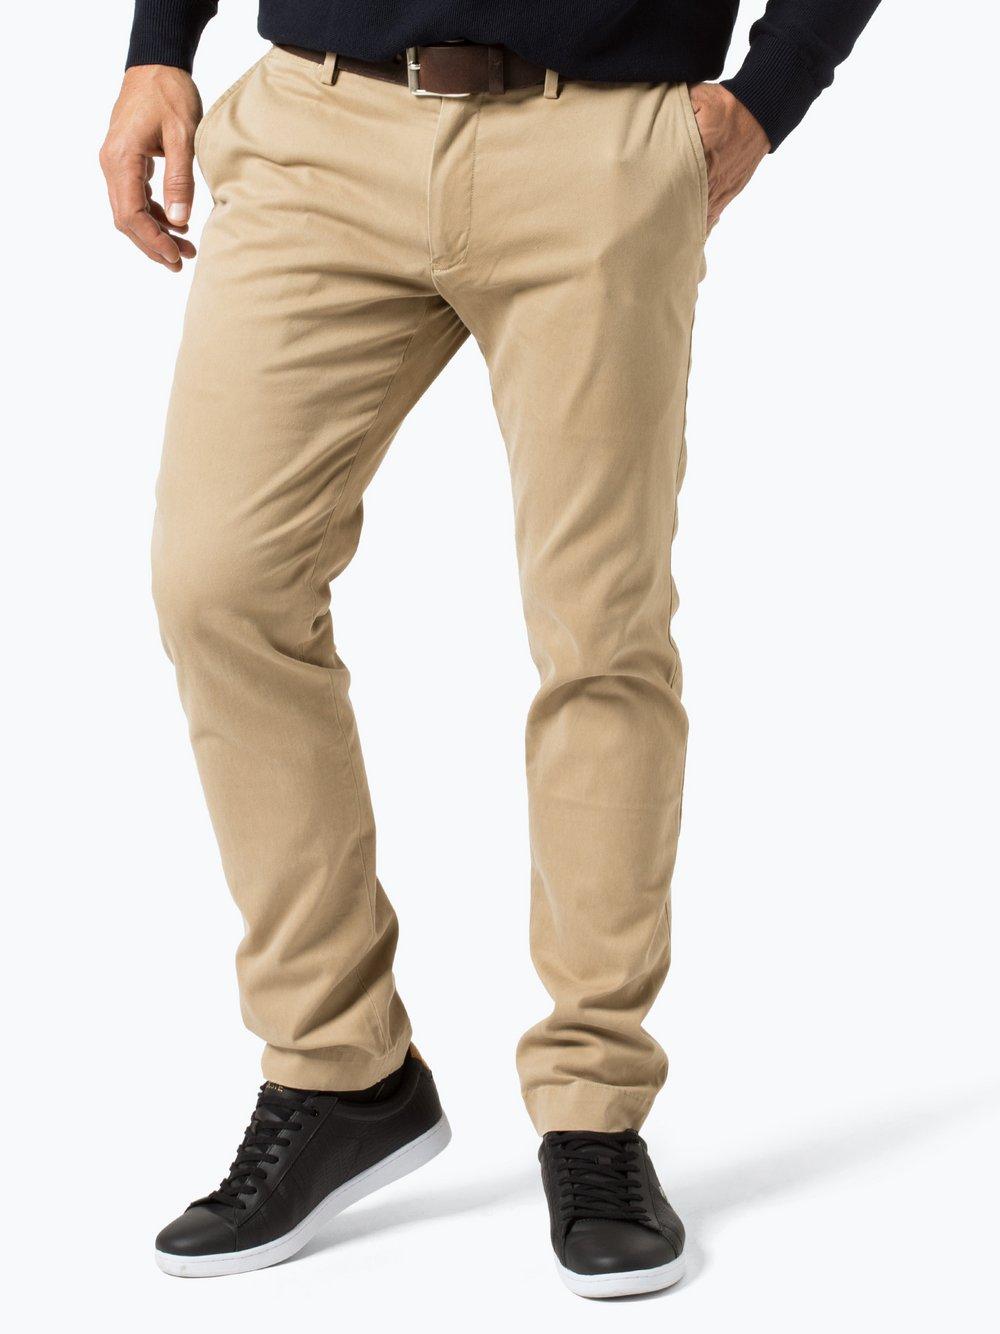 15154a4fd Polo Ralph Lauren Spodnie męskie kup online | VANGRAAF.COM